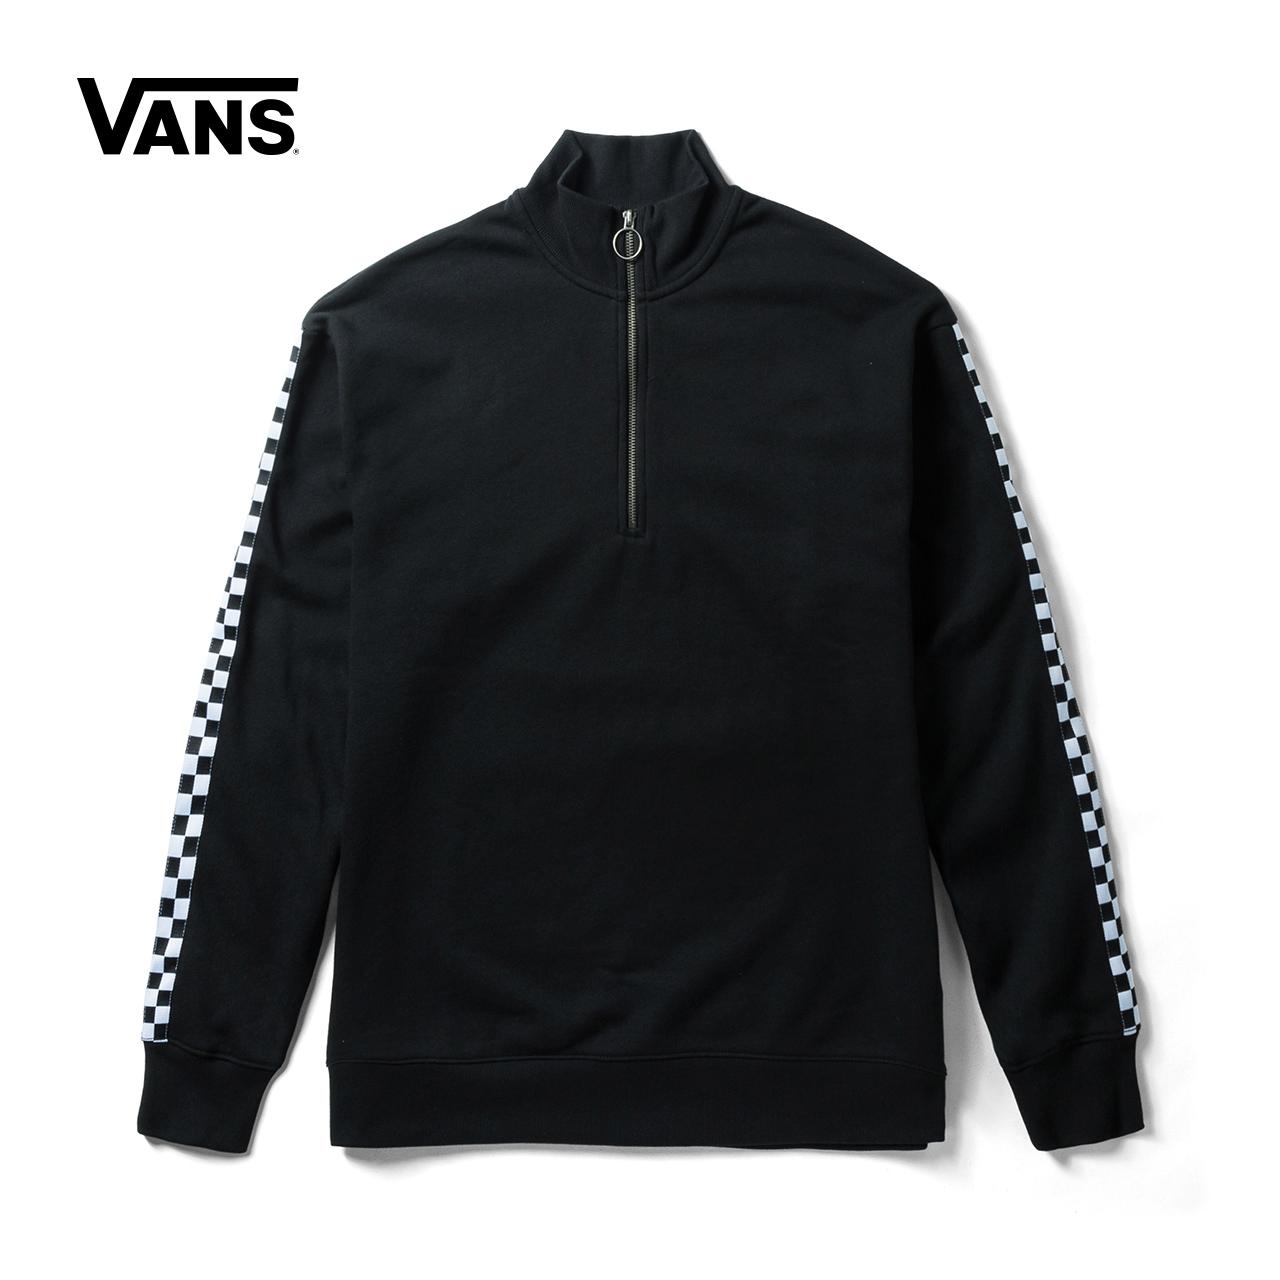 Vans 范斯官方秋季女款黑色加绒套头卫衣|VN0A3QVWBLK